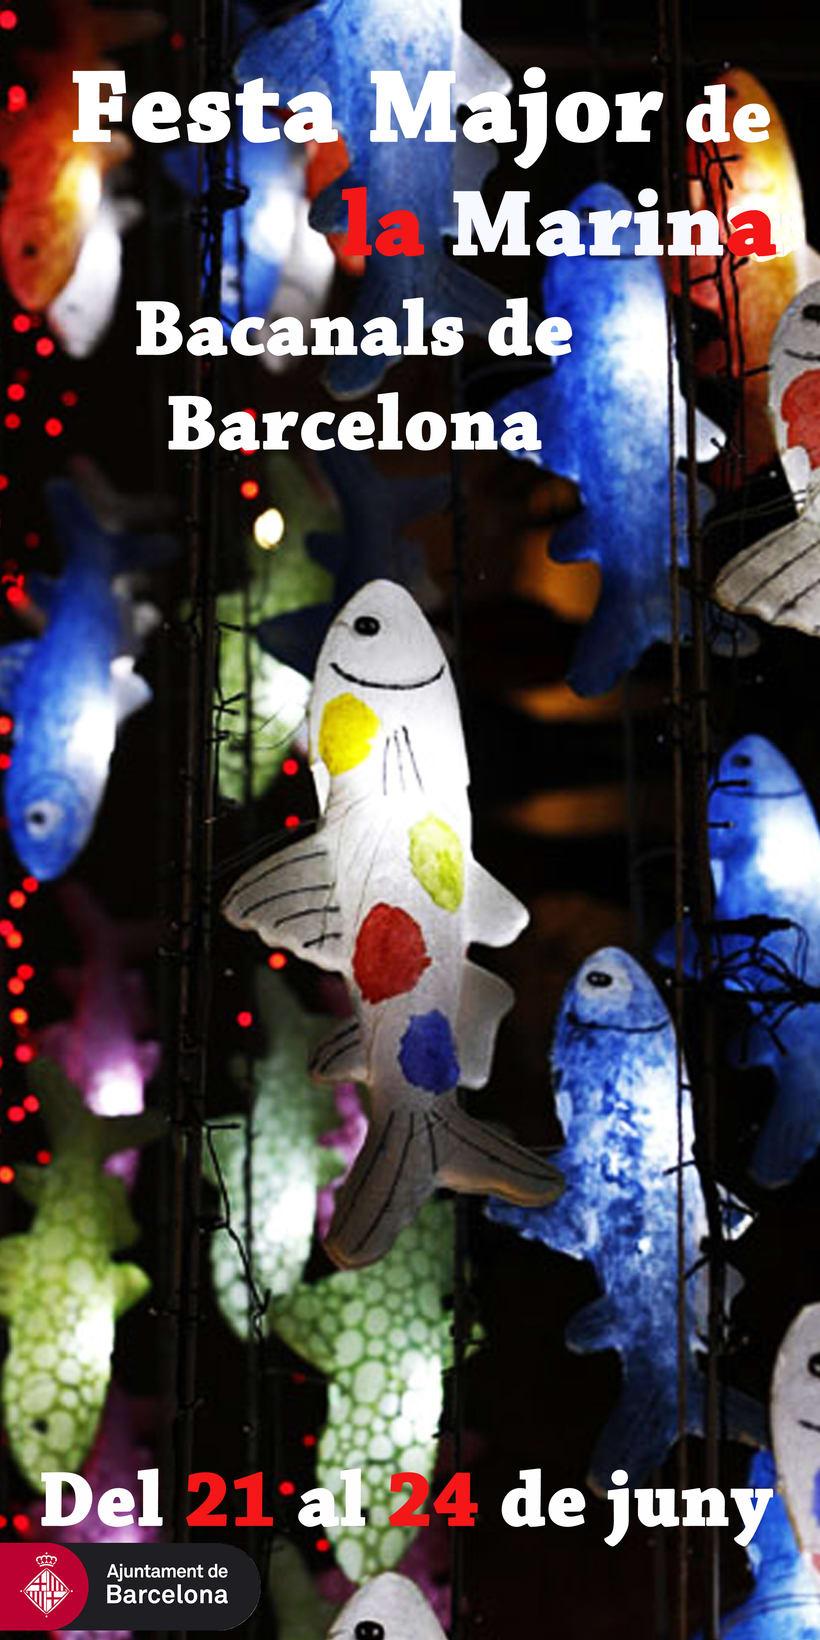 Festes Majors de Barcelona 4